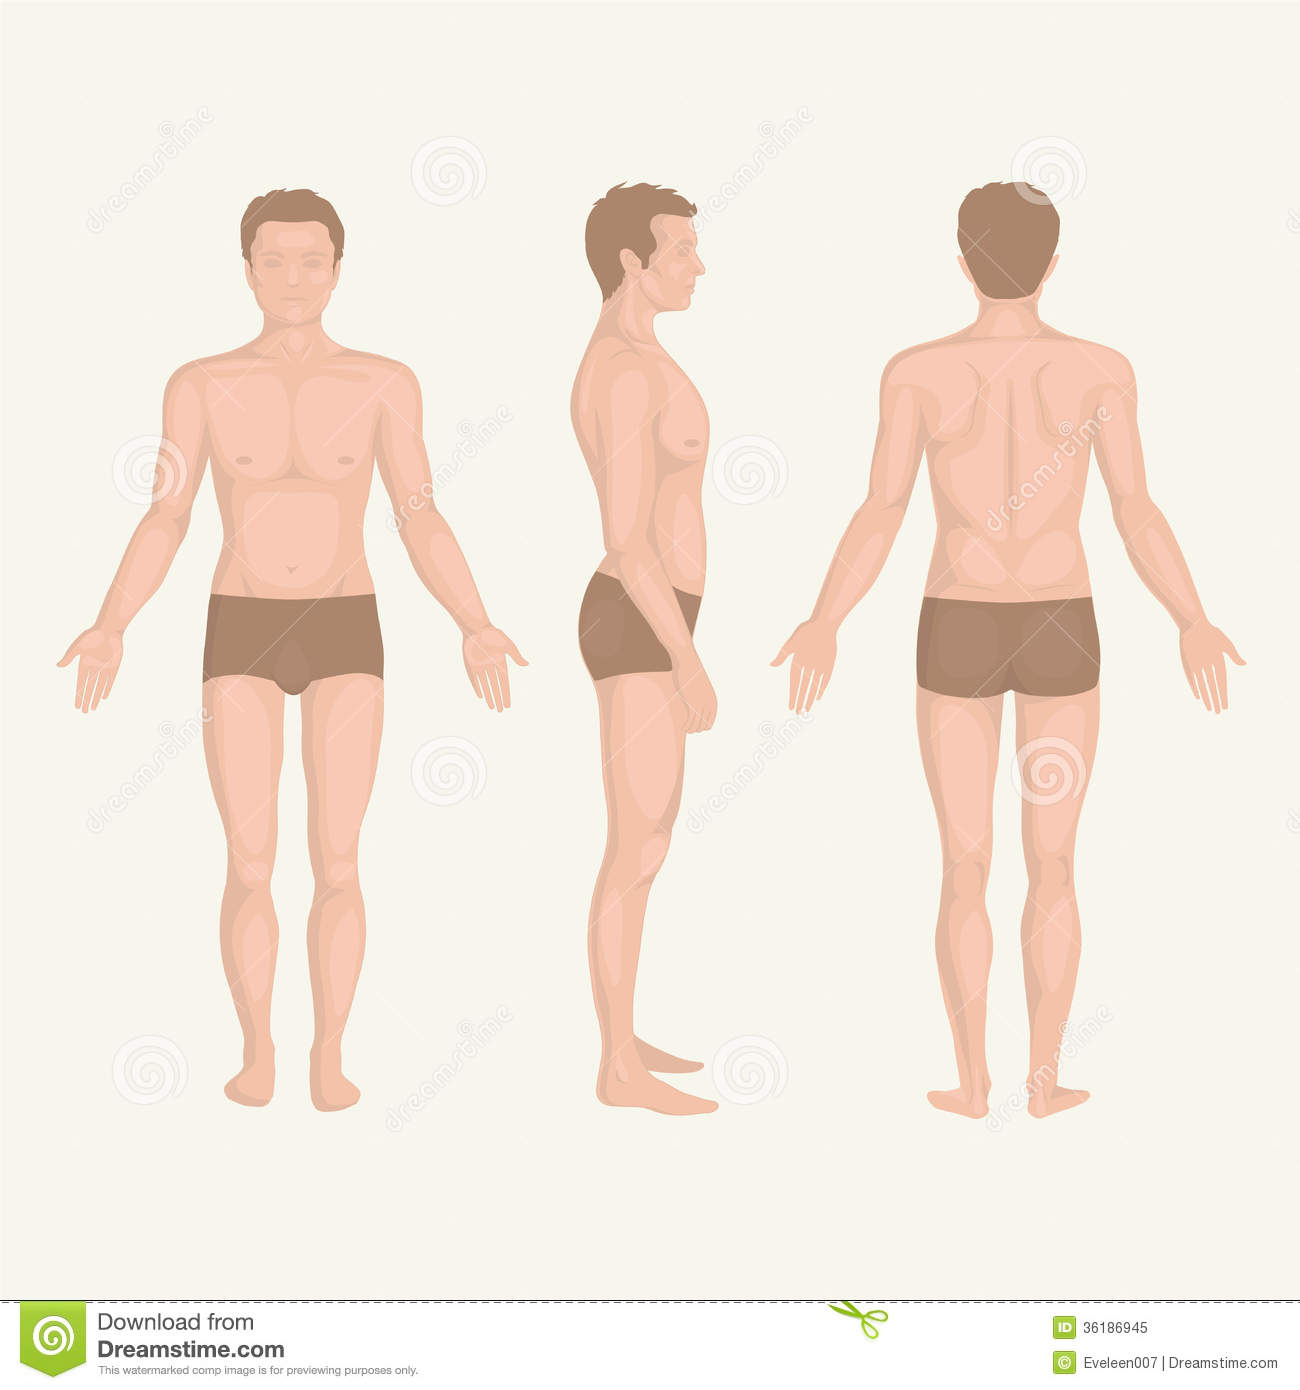 Human clipart human standing #12